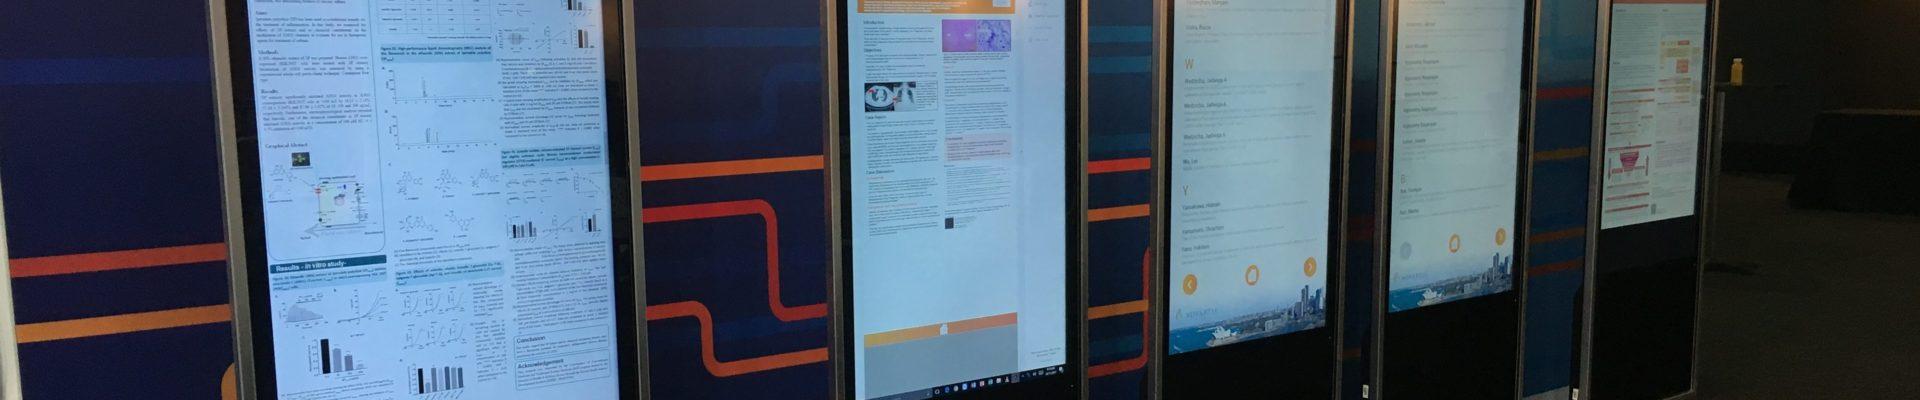 Interactive Exhibition Floor Plan